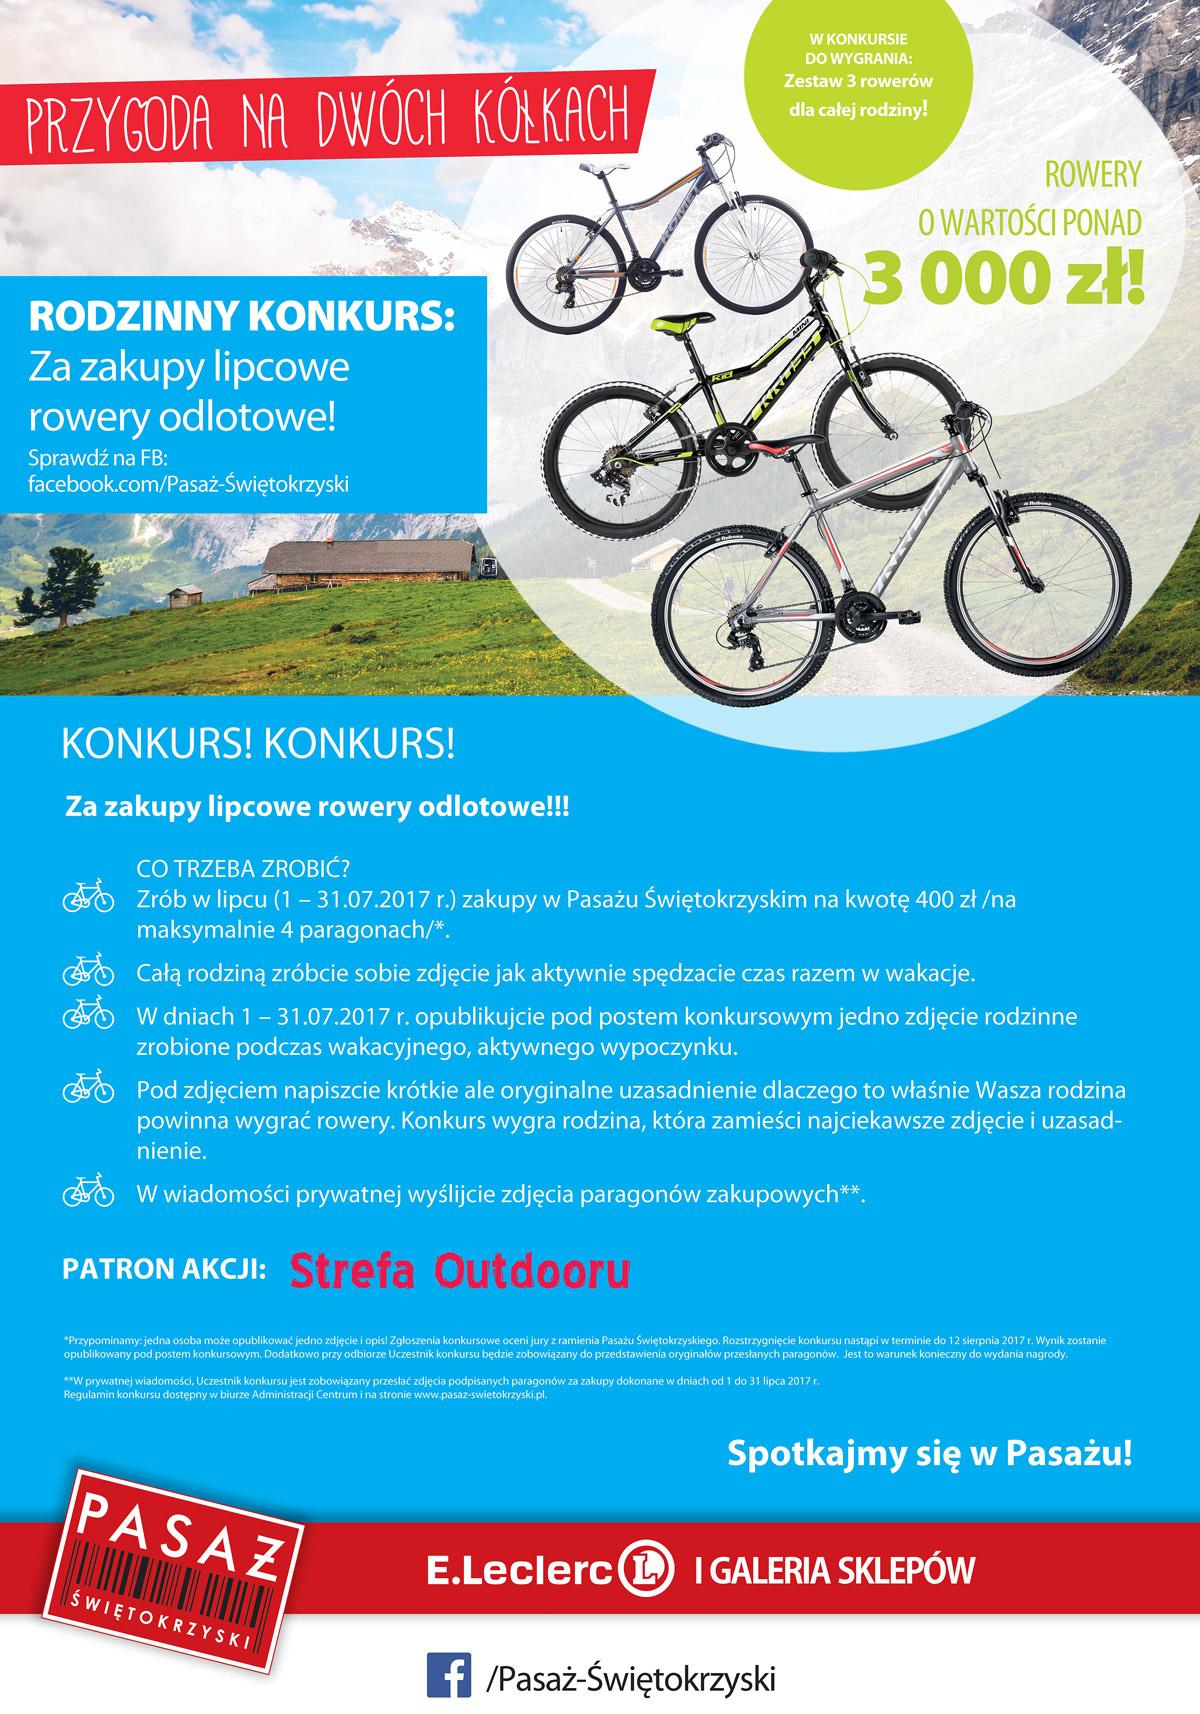 PS-plakat-rowery-konkurs_2017